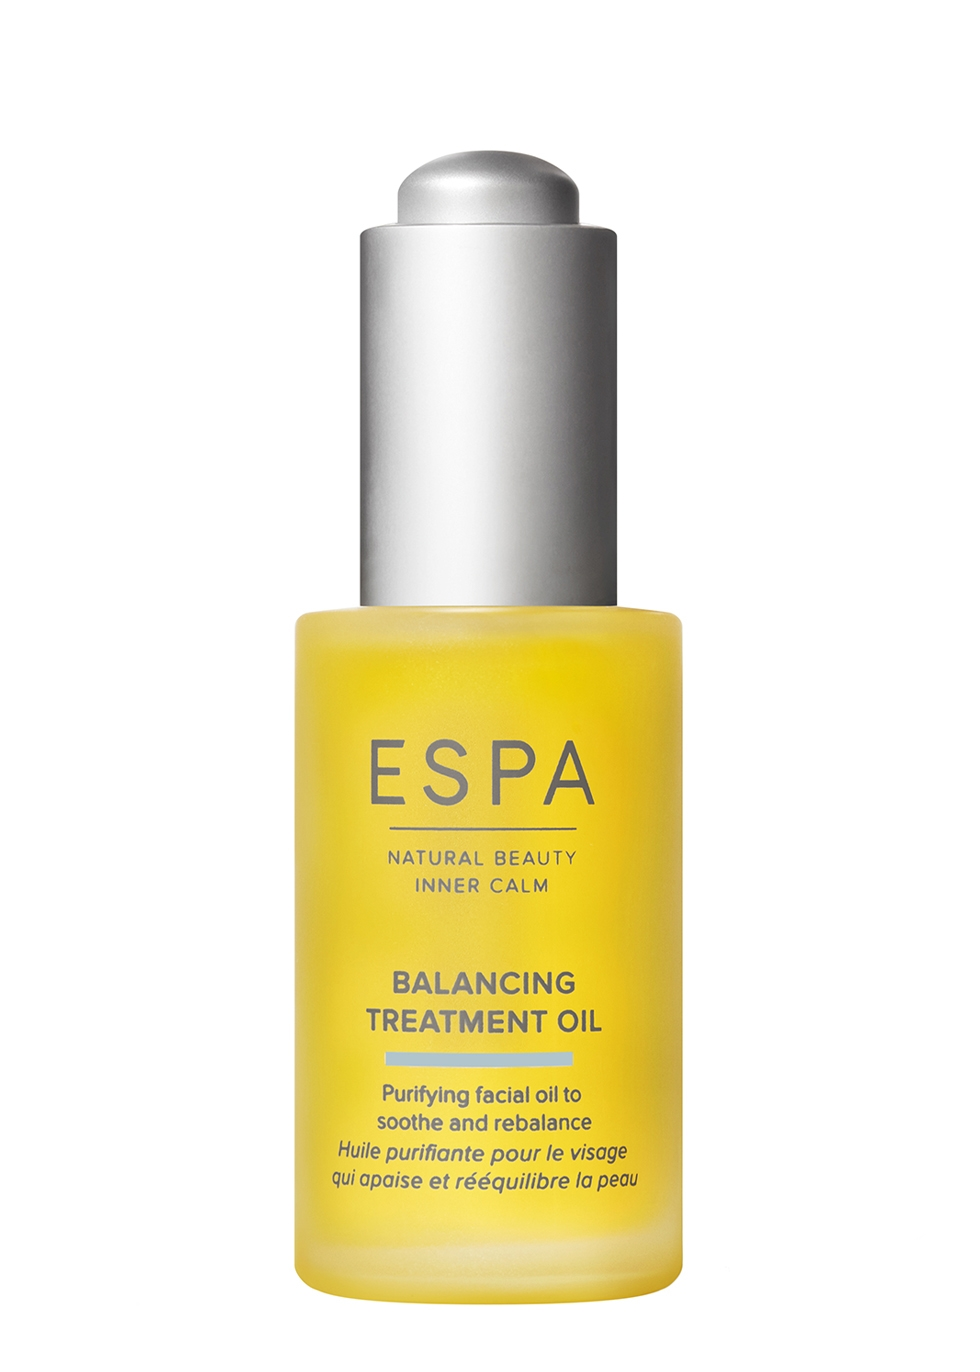 Balancing Face Treatment Oil 30ml